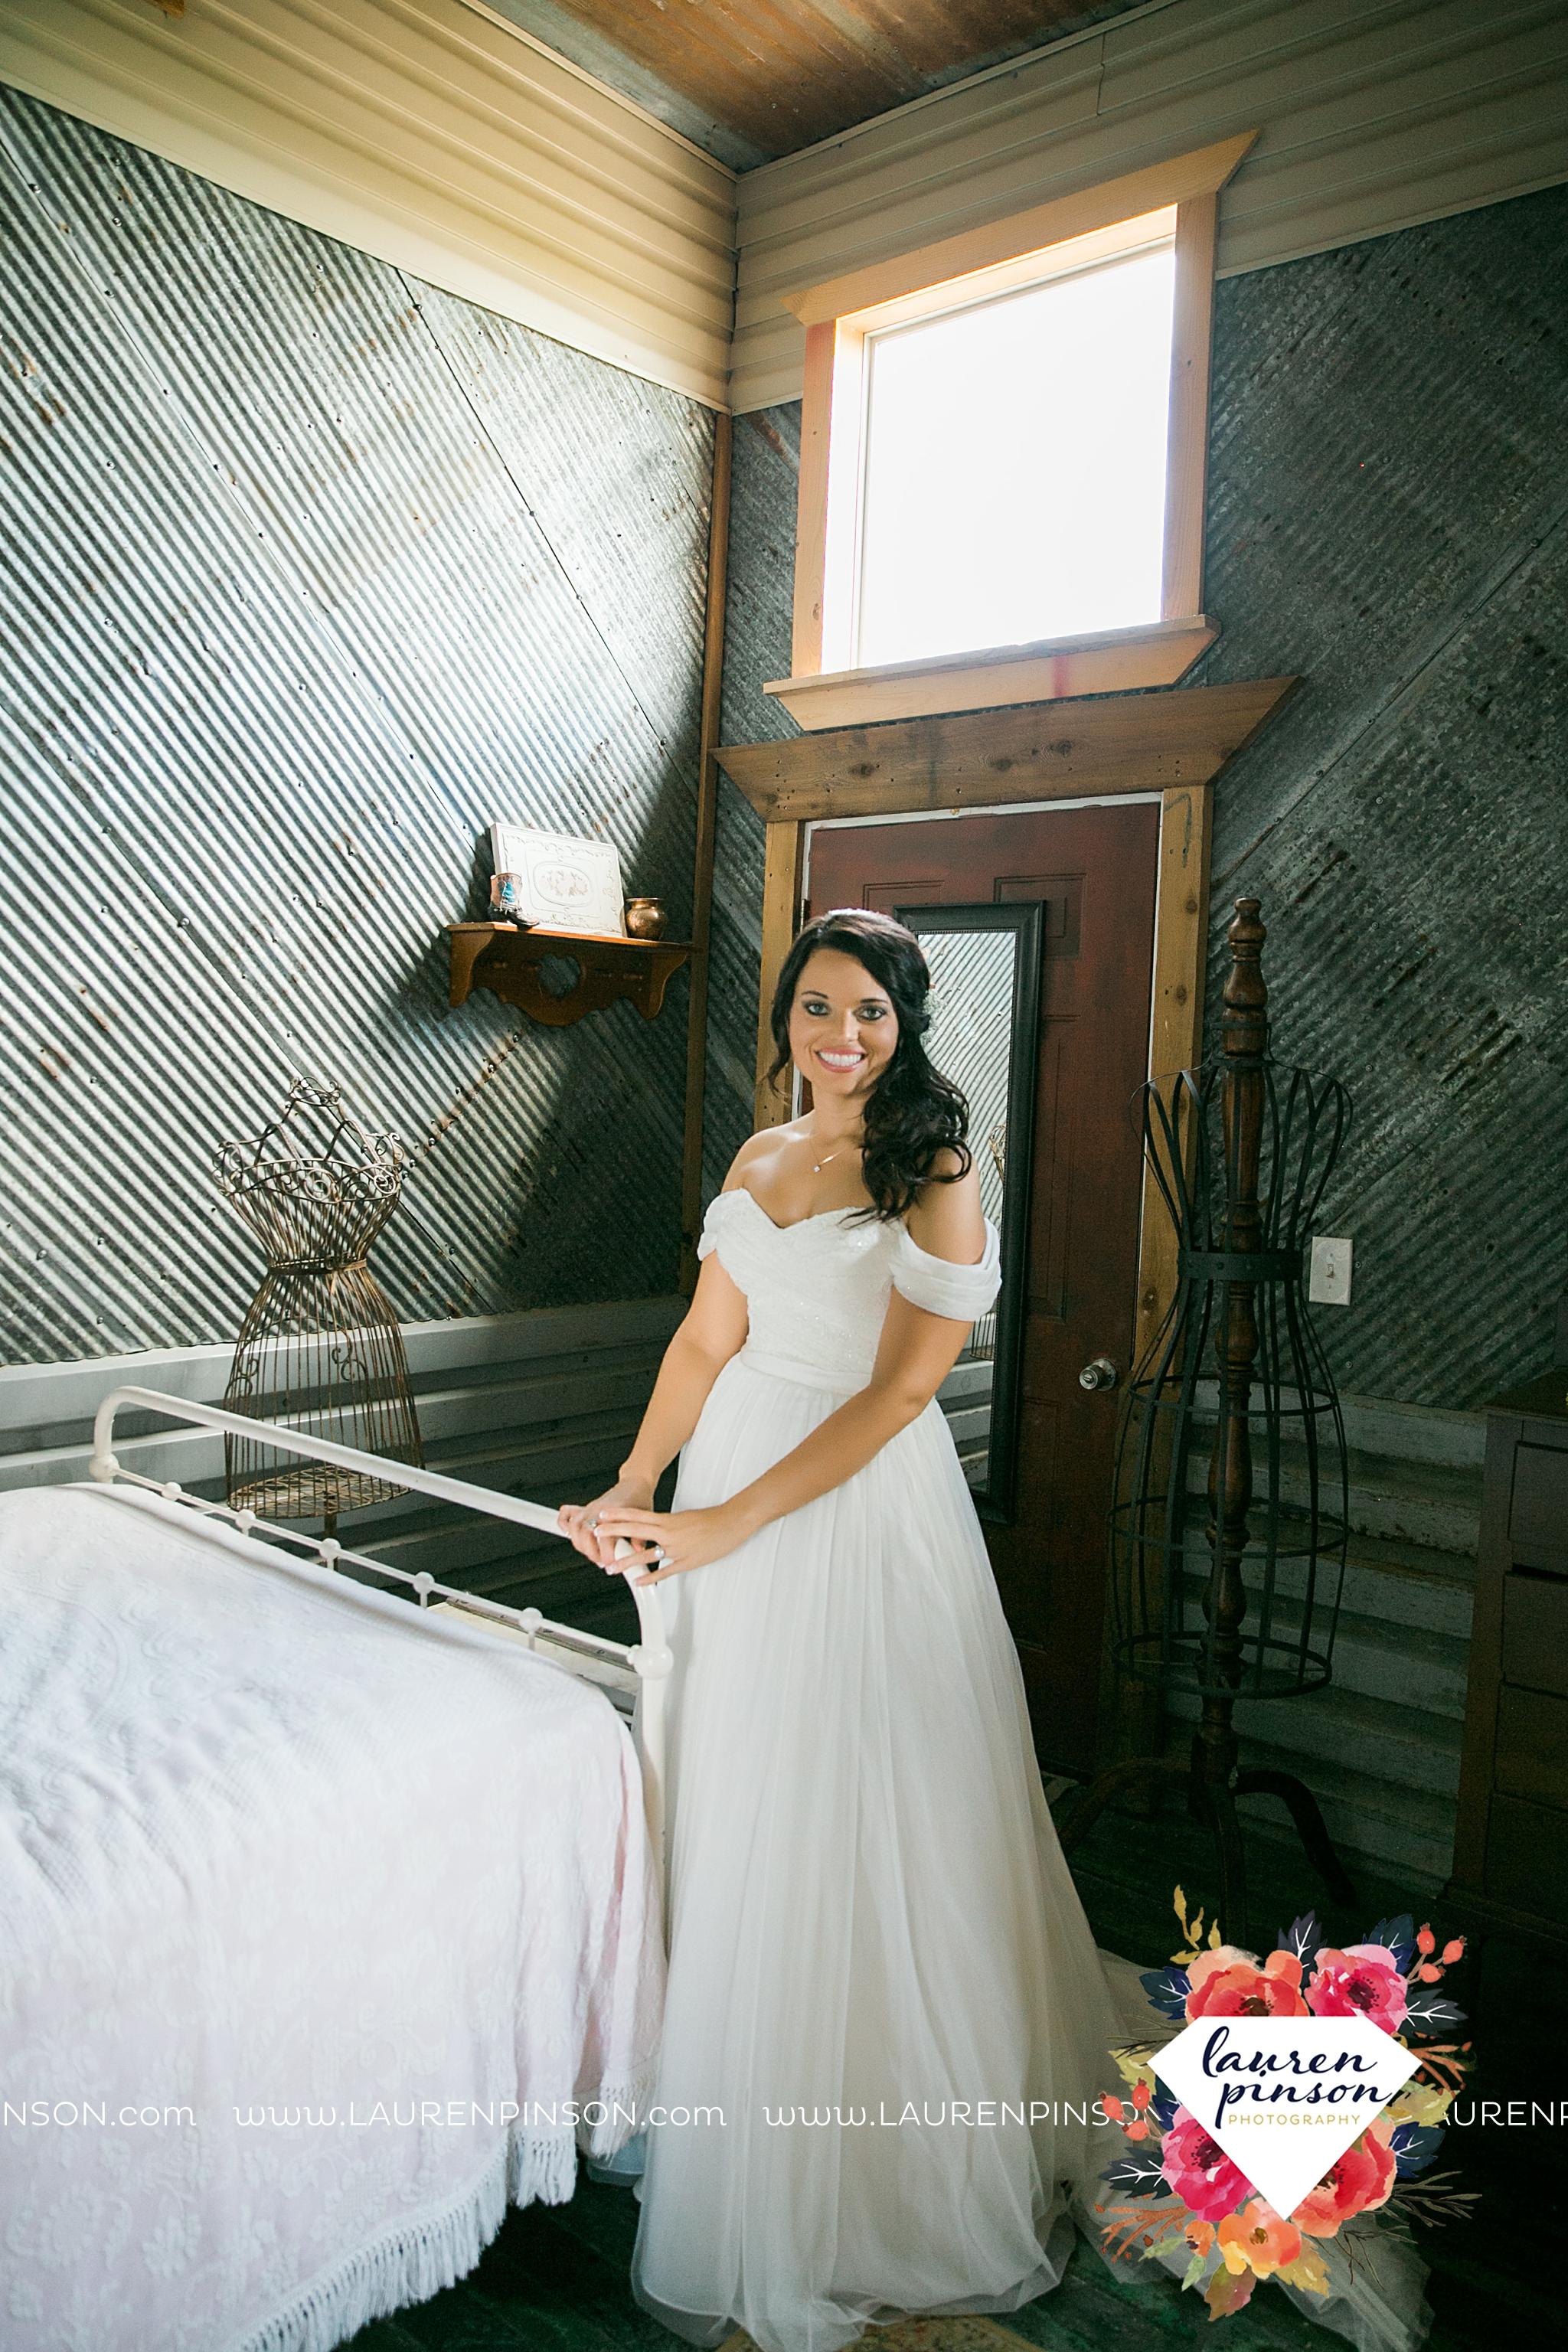 jones-barn-willow-creek-ranch-wedding-in-cleburne-texas-fort-worth-dfw-wichita-falls-wedding-photography_3197.jpg